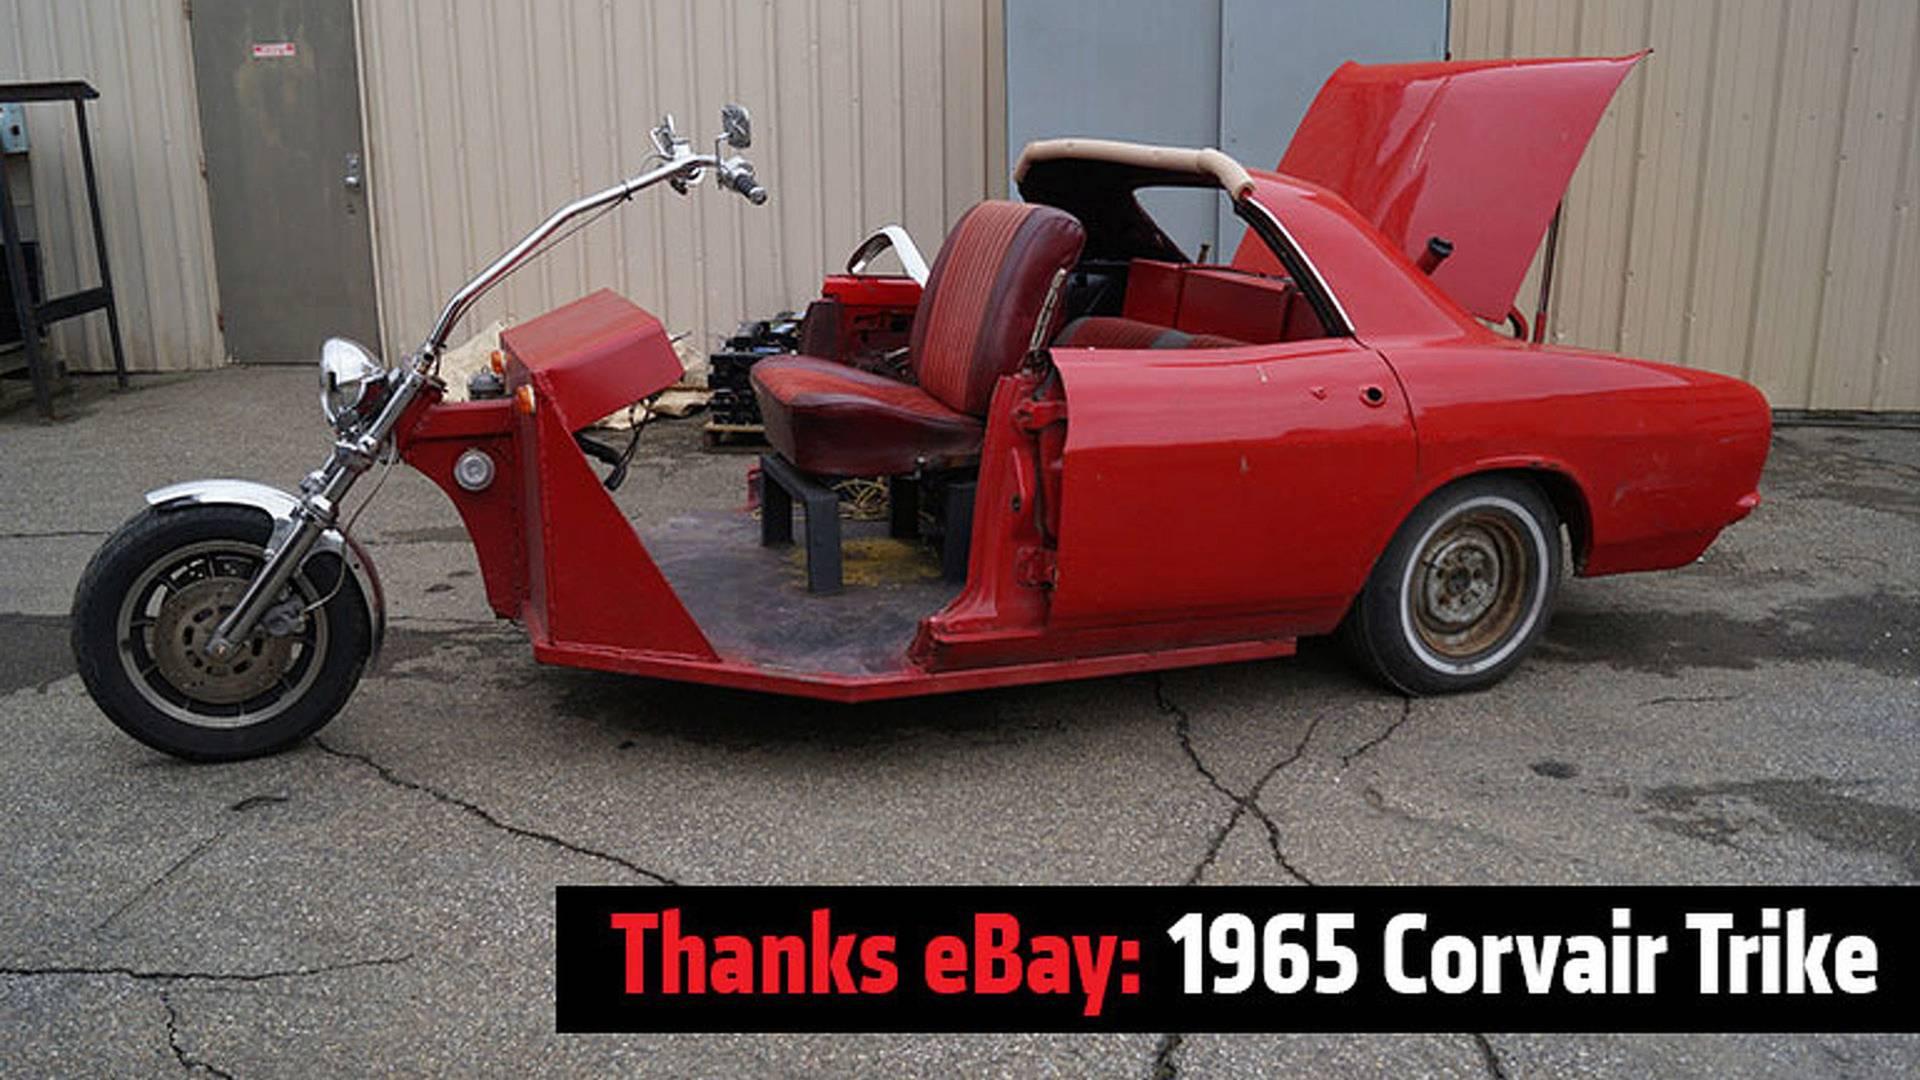 Thanks Ebay 1965 Corvair Trike